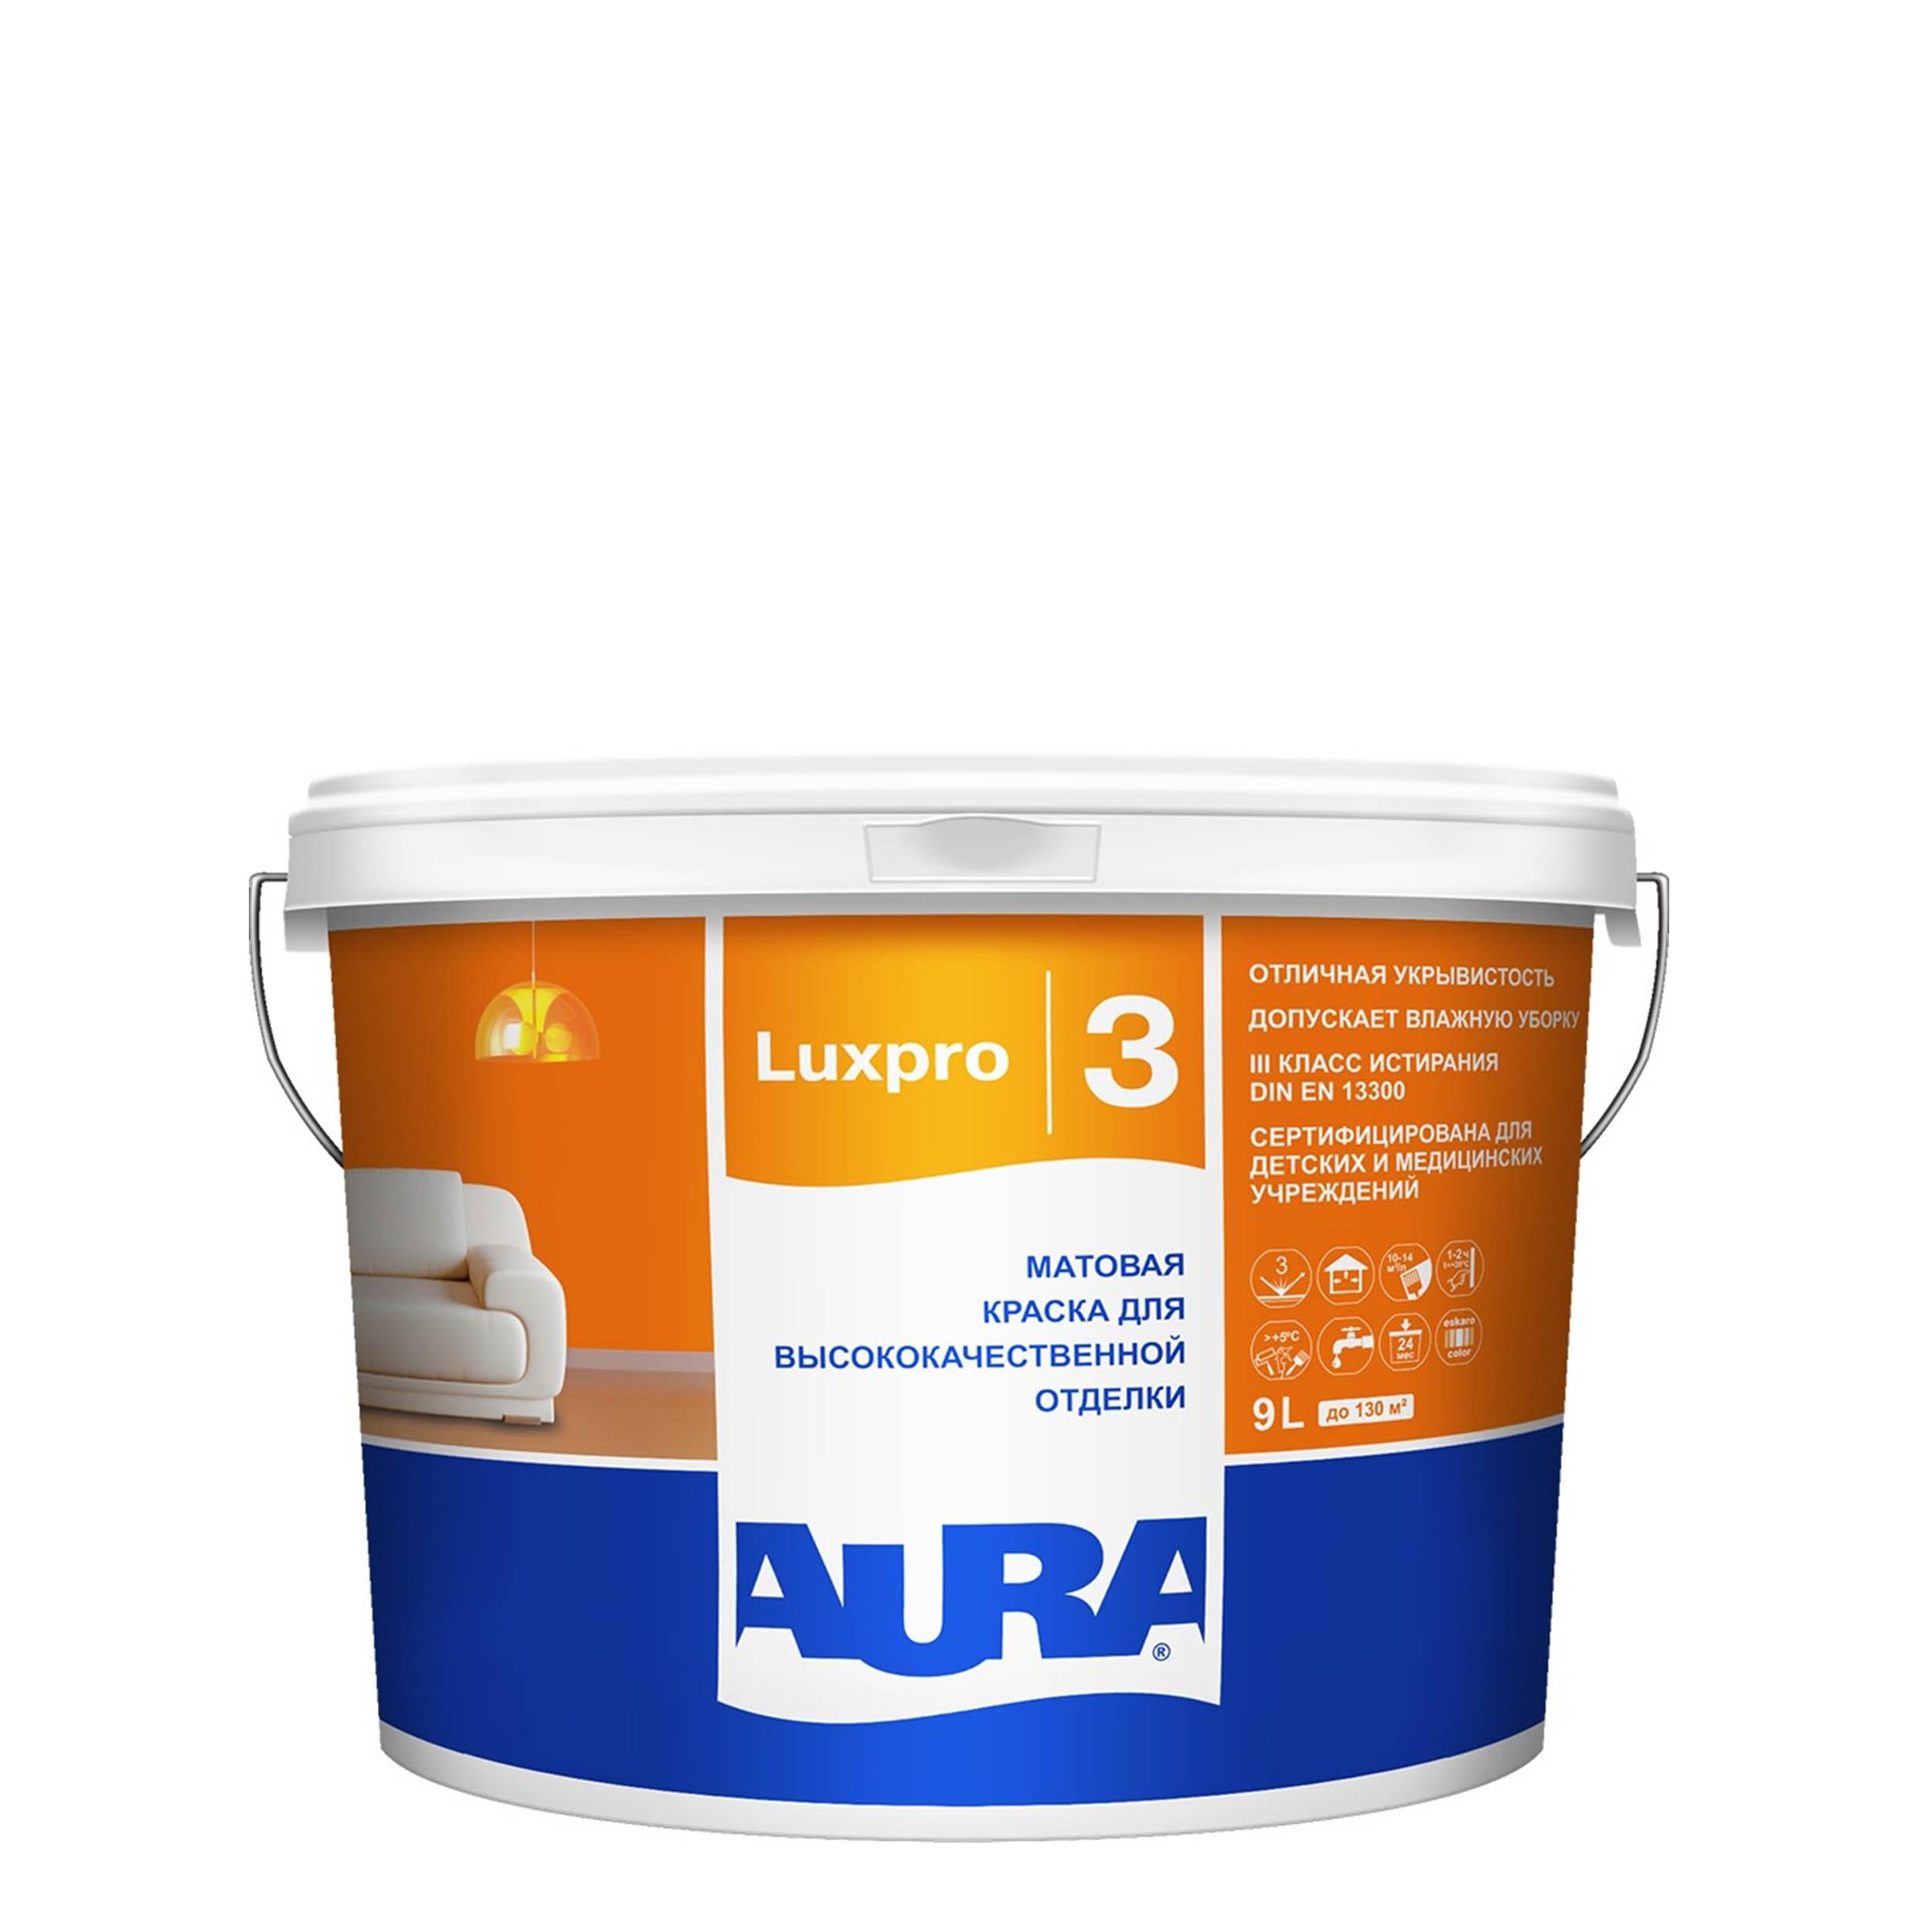 Фото 10 - Краска интерьерная, Aura LuxPRO 3, RAL 1012, 11 кг.